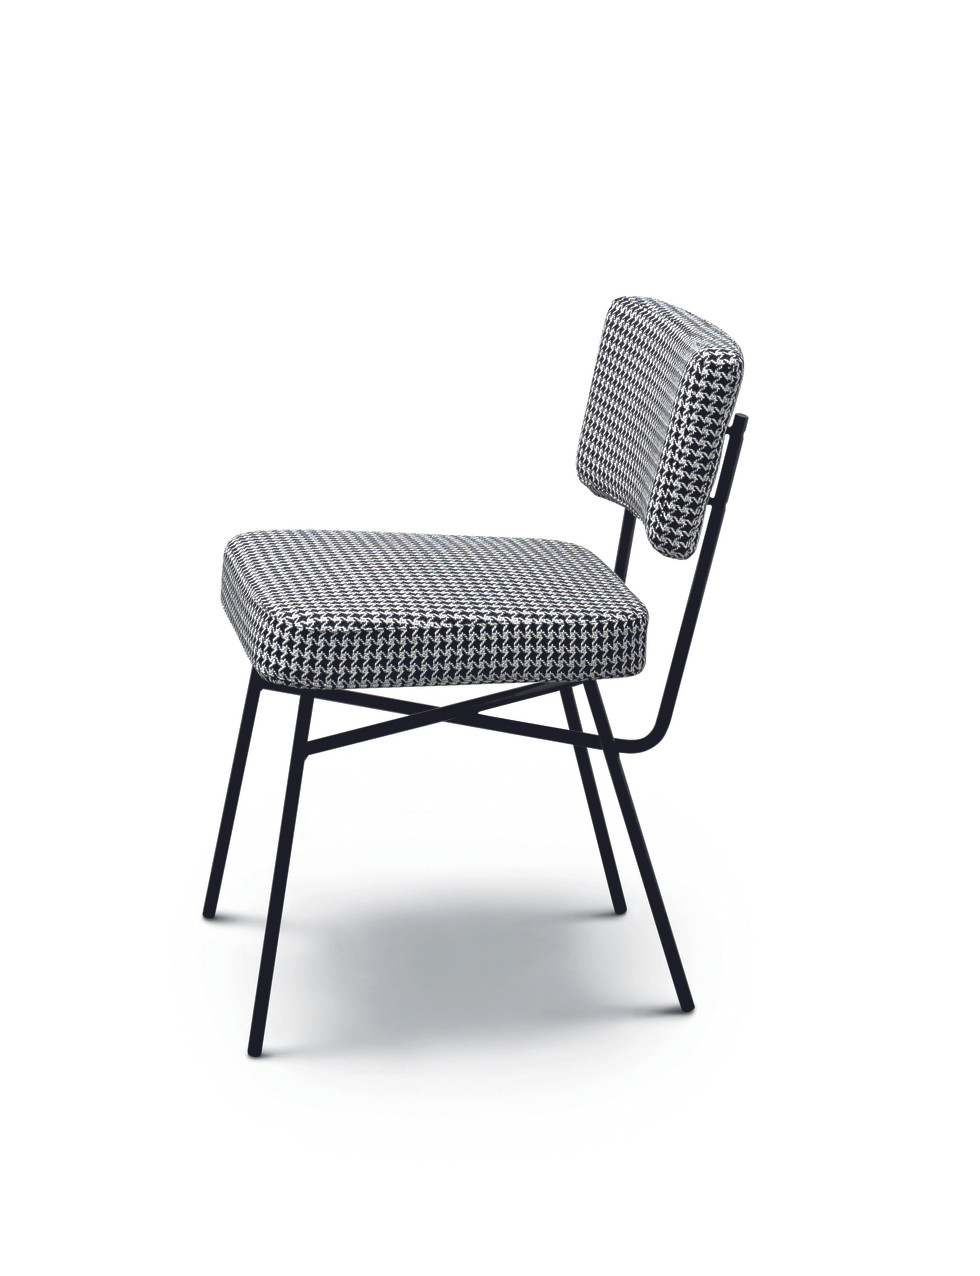 arflex-elettra-chair-design-bbprjp